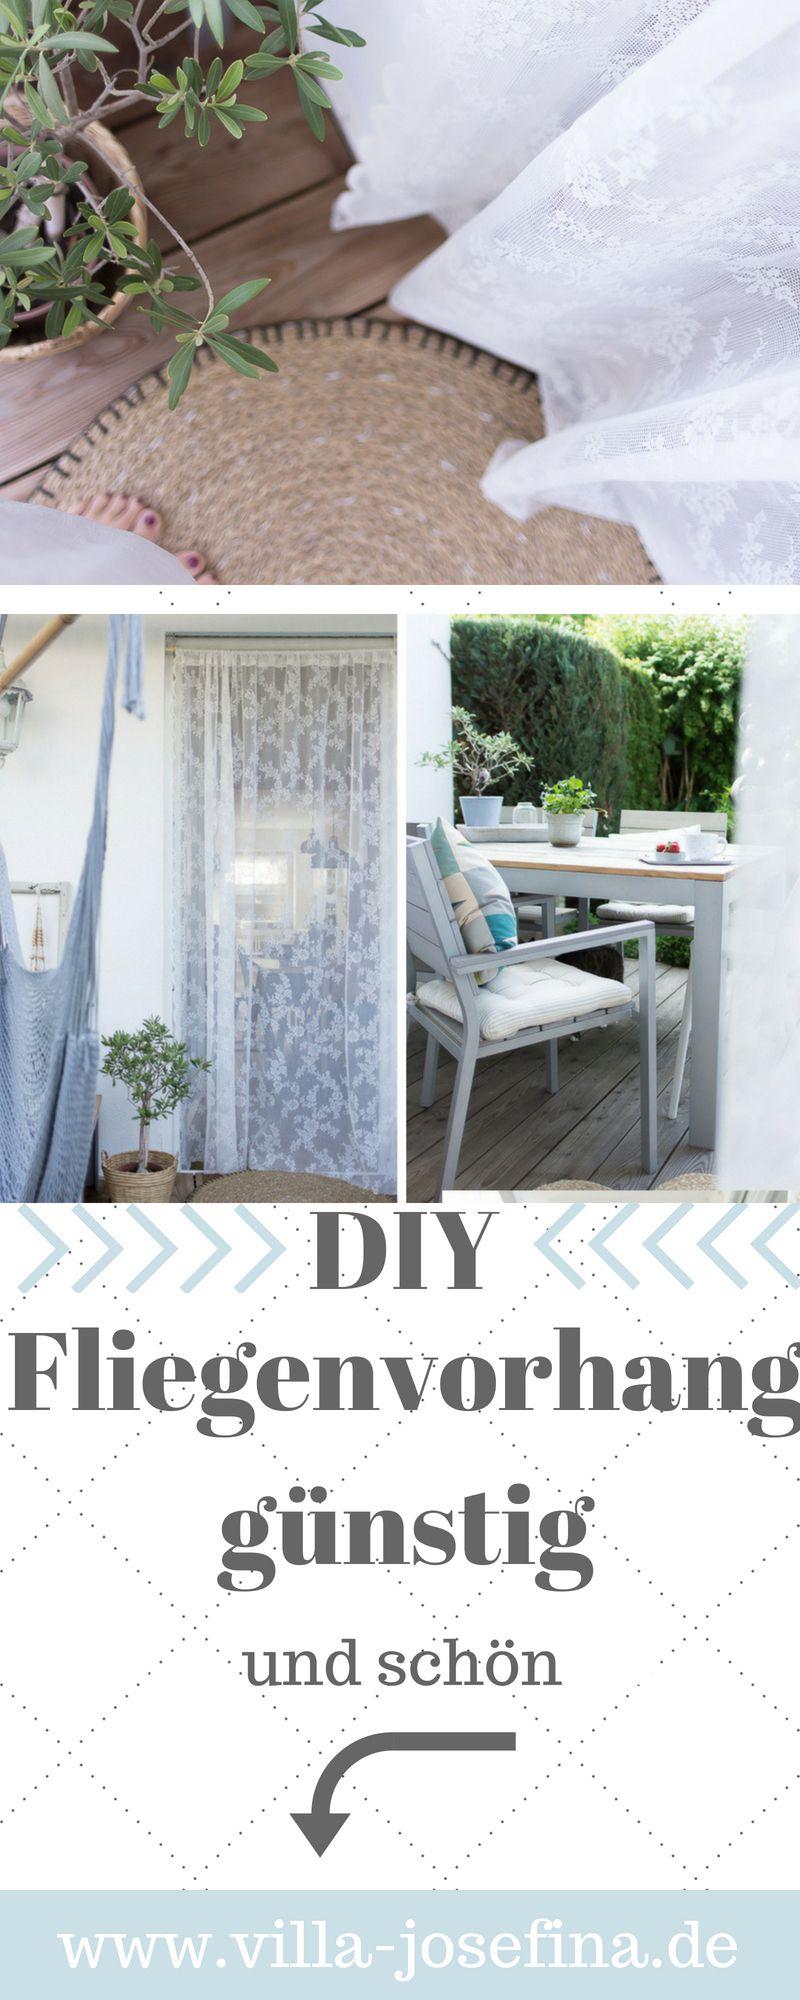 diy fliegenvorhang g nstig und sch n camper vorh nge terrasse und g nstig. Black Bedroom Furniture Sets. Home Design Ideas